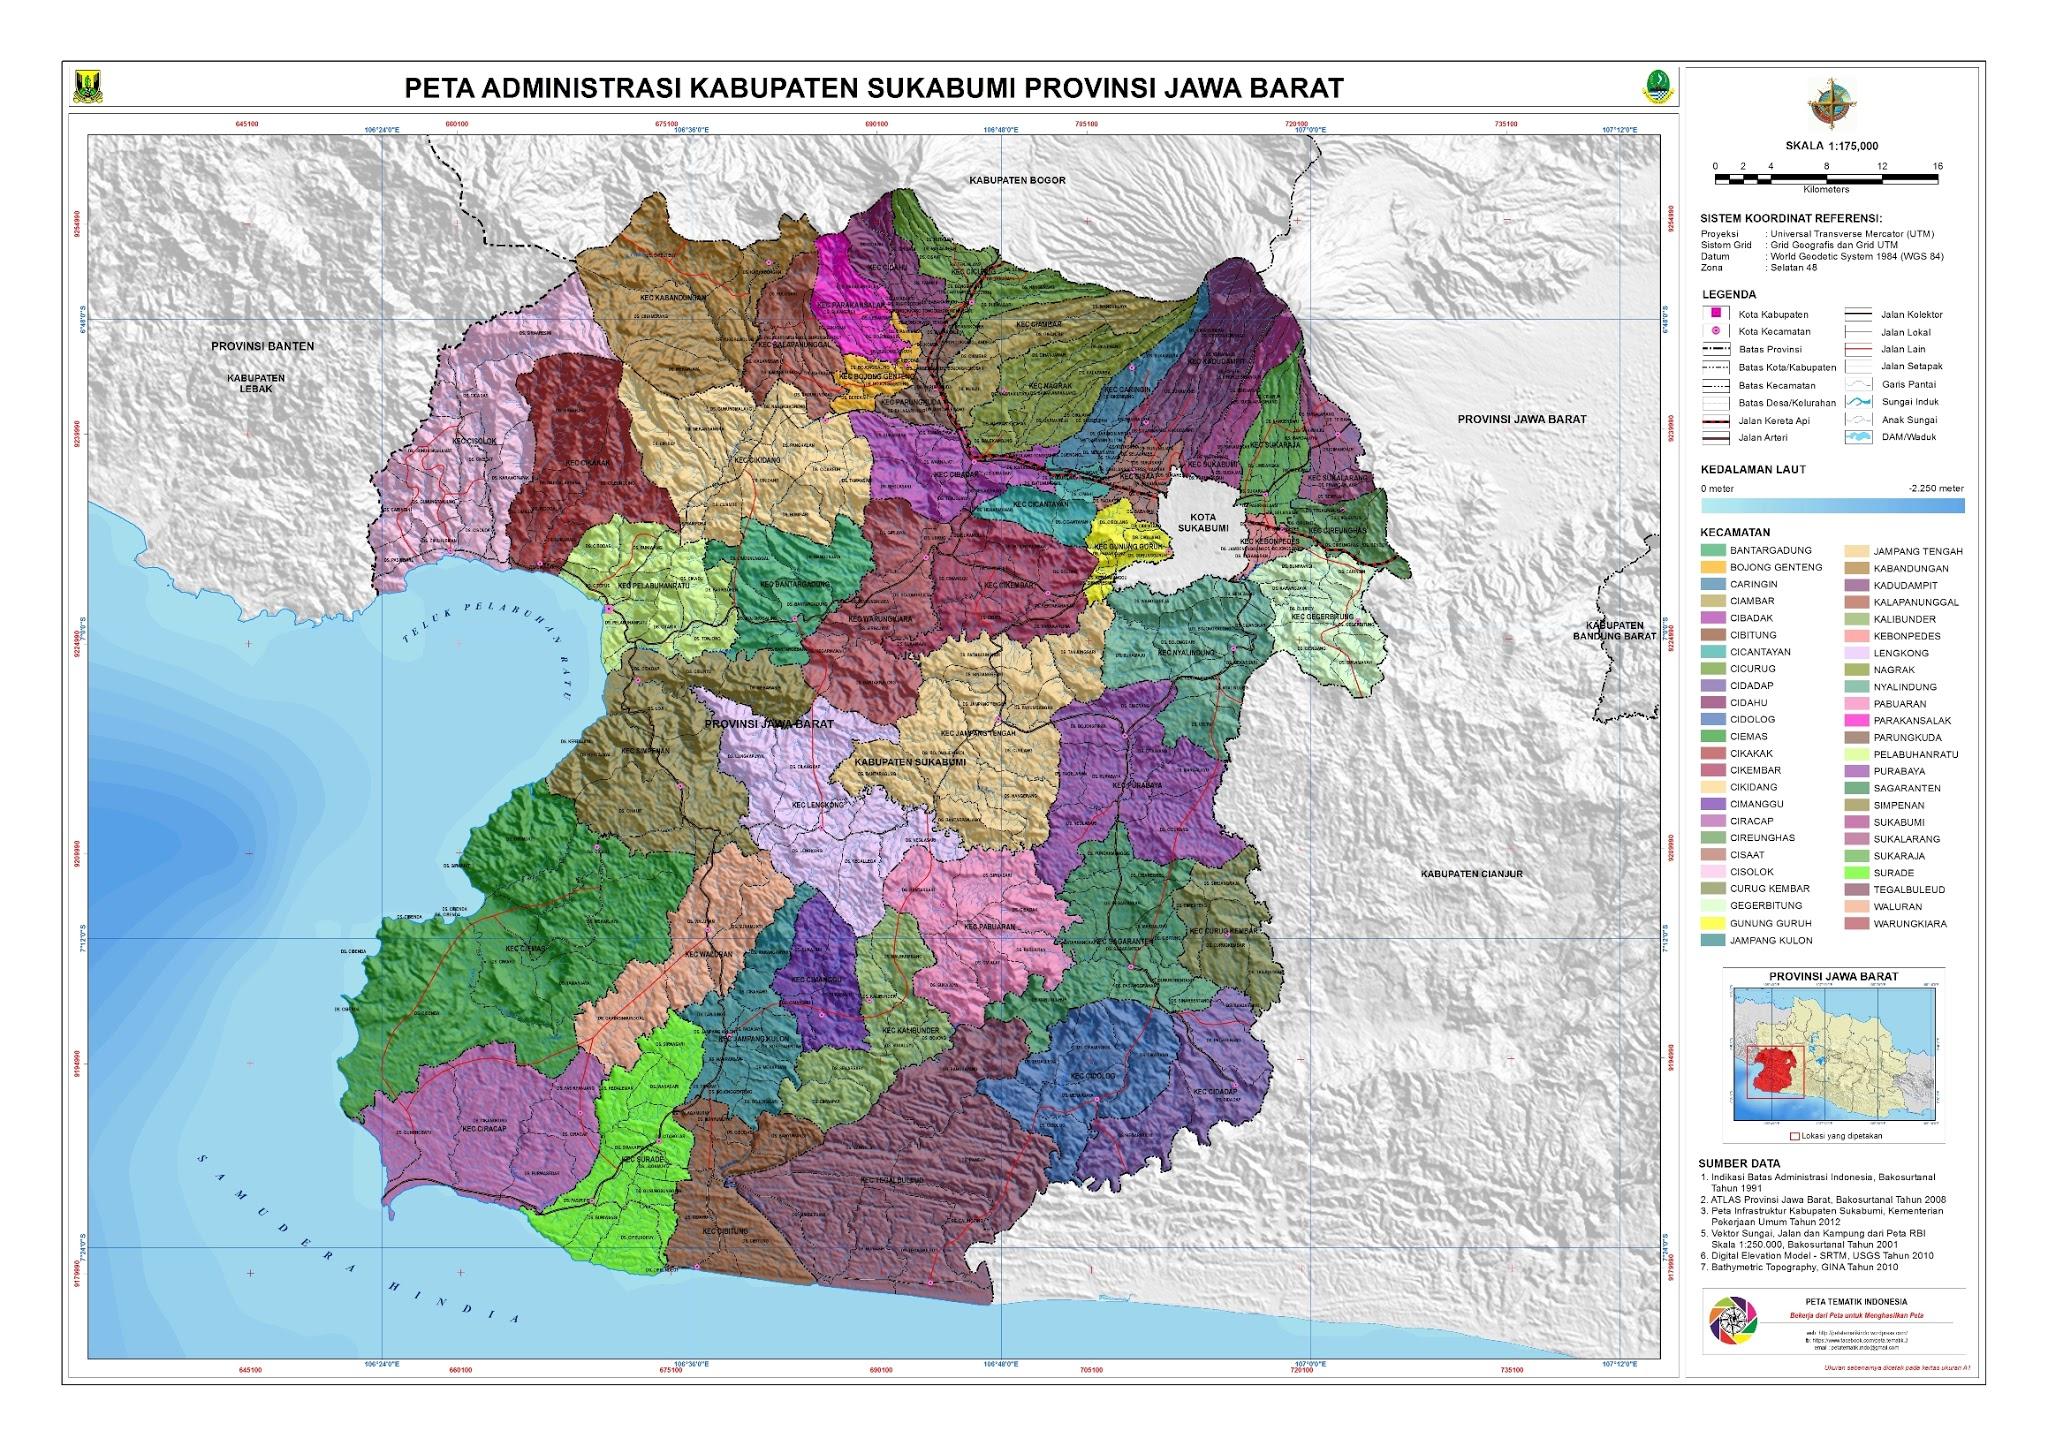 Peta Kota: Peta Kabupaten Sukabumi